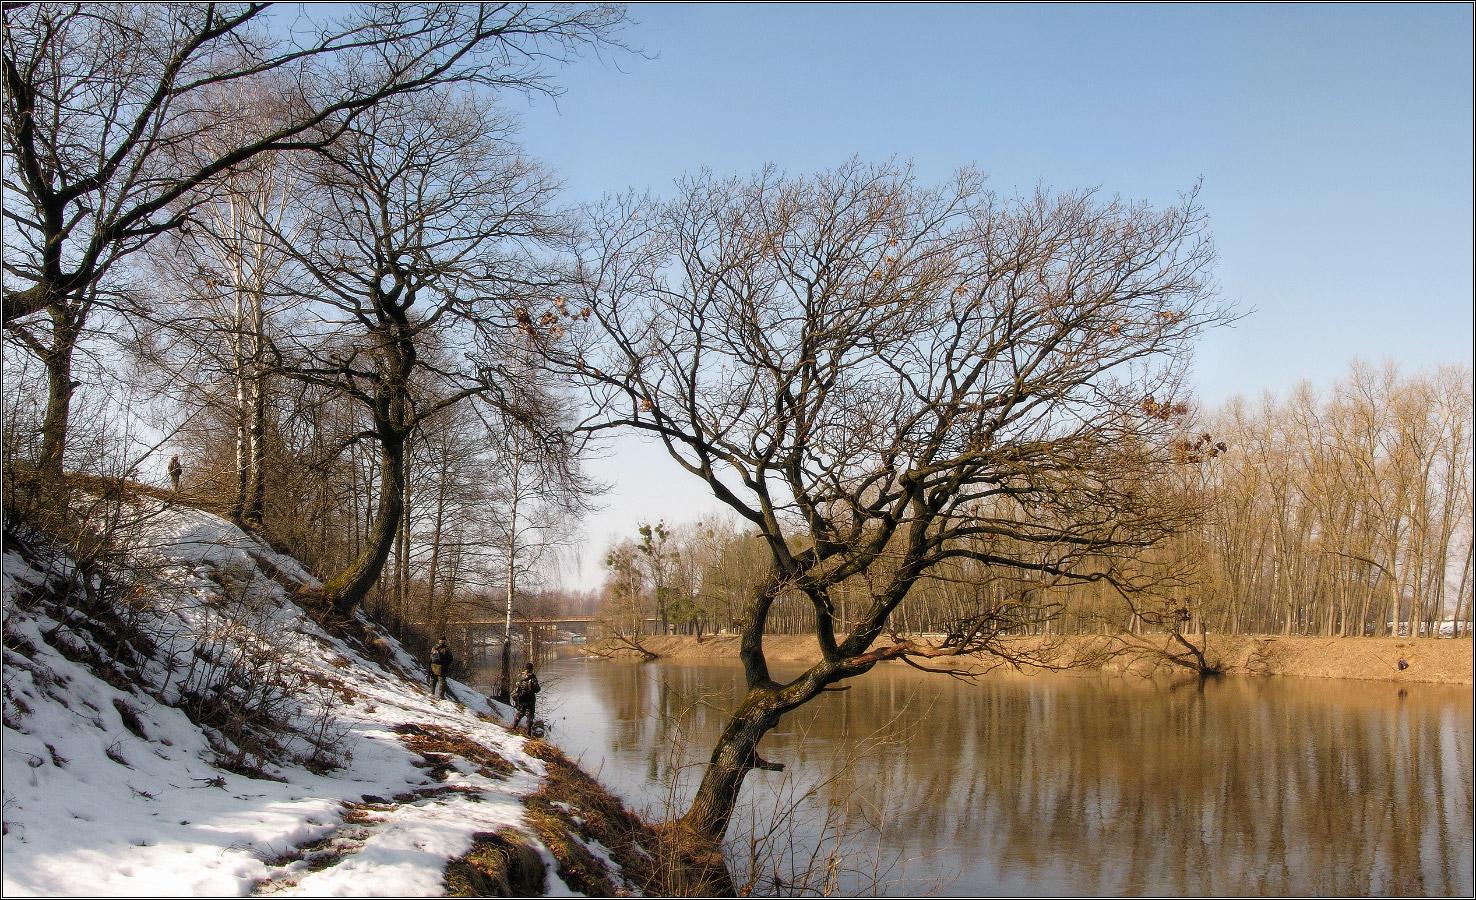 http://i2.imageban.ru/out/2012/03/17/f18a67eba83dd18bc487956451049247.jpg